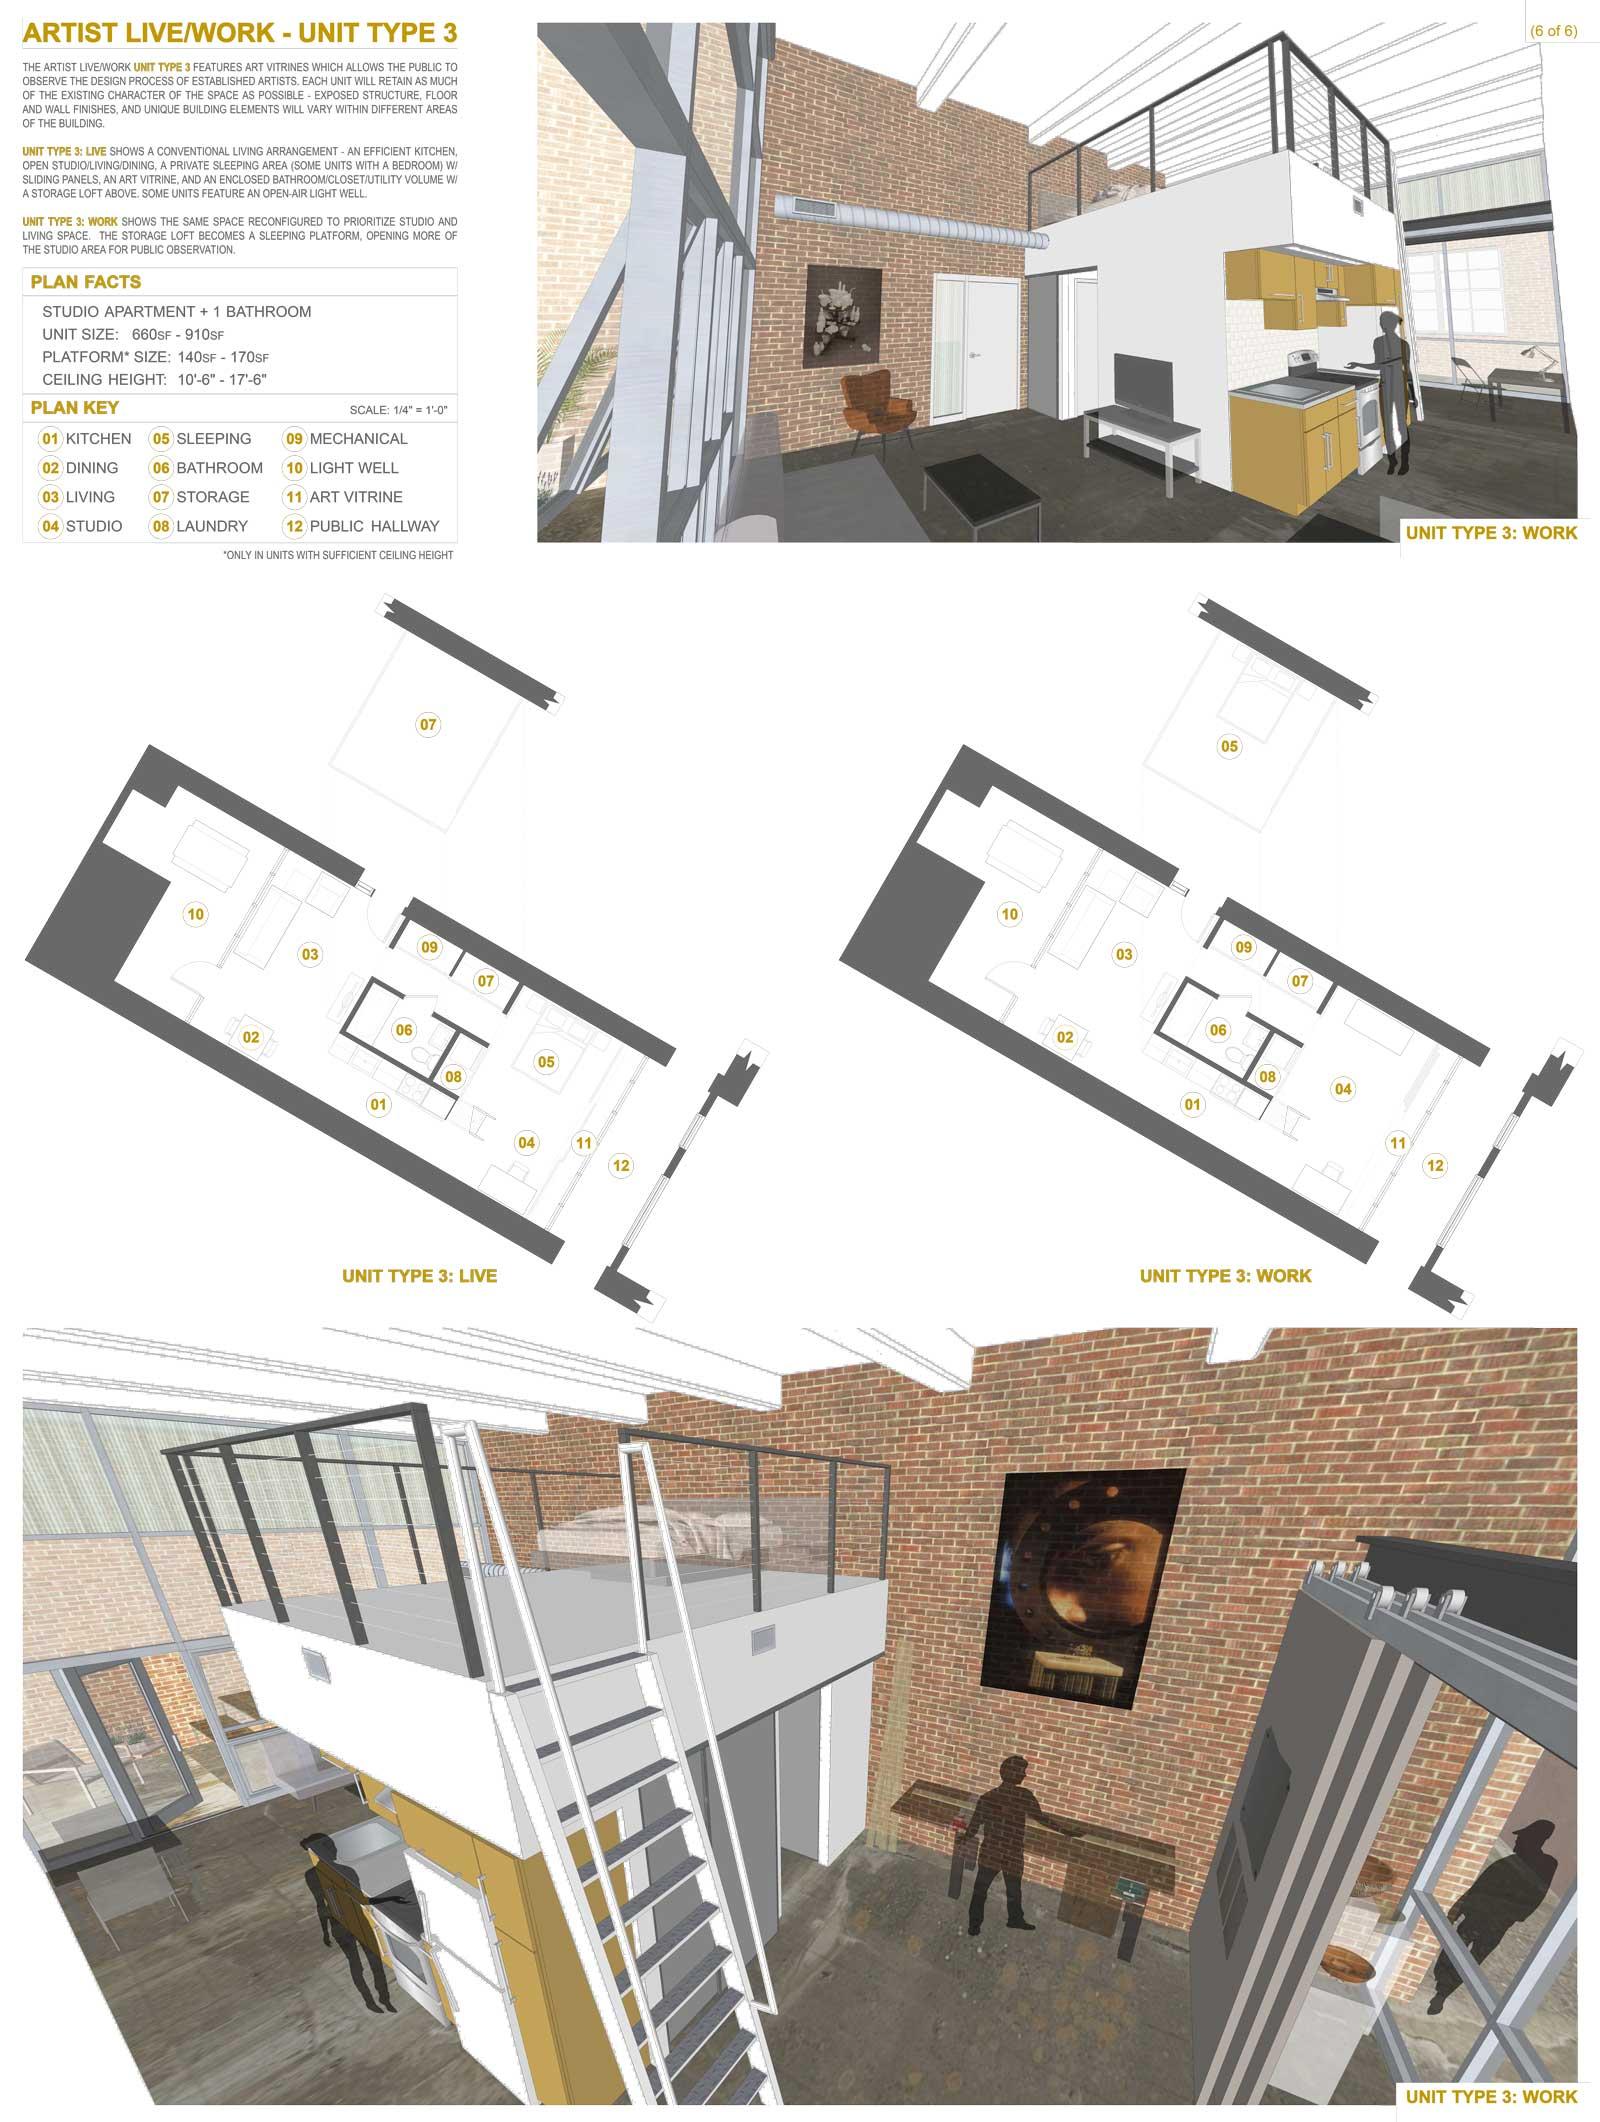 06-BREW-HOUSE---ARTIST-LIVE-WORK-UNIT-TYPE-3-reduced.jpg